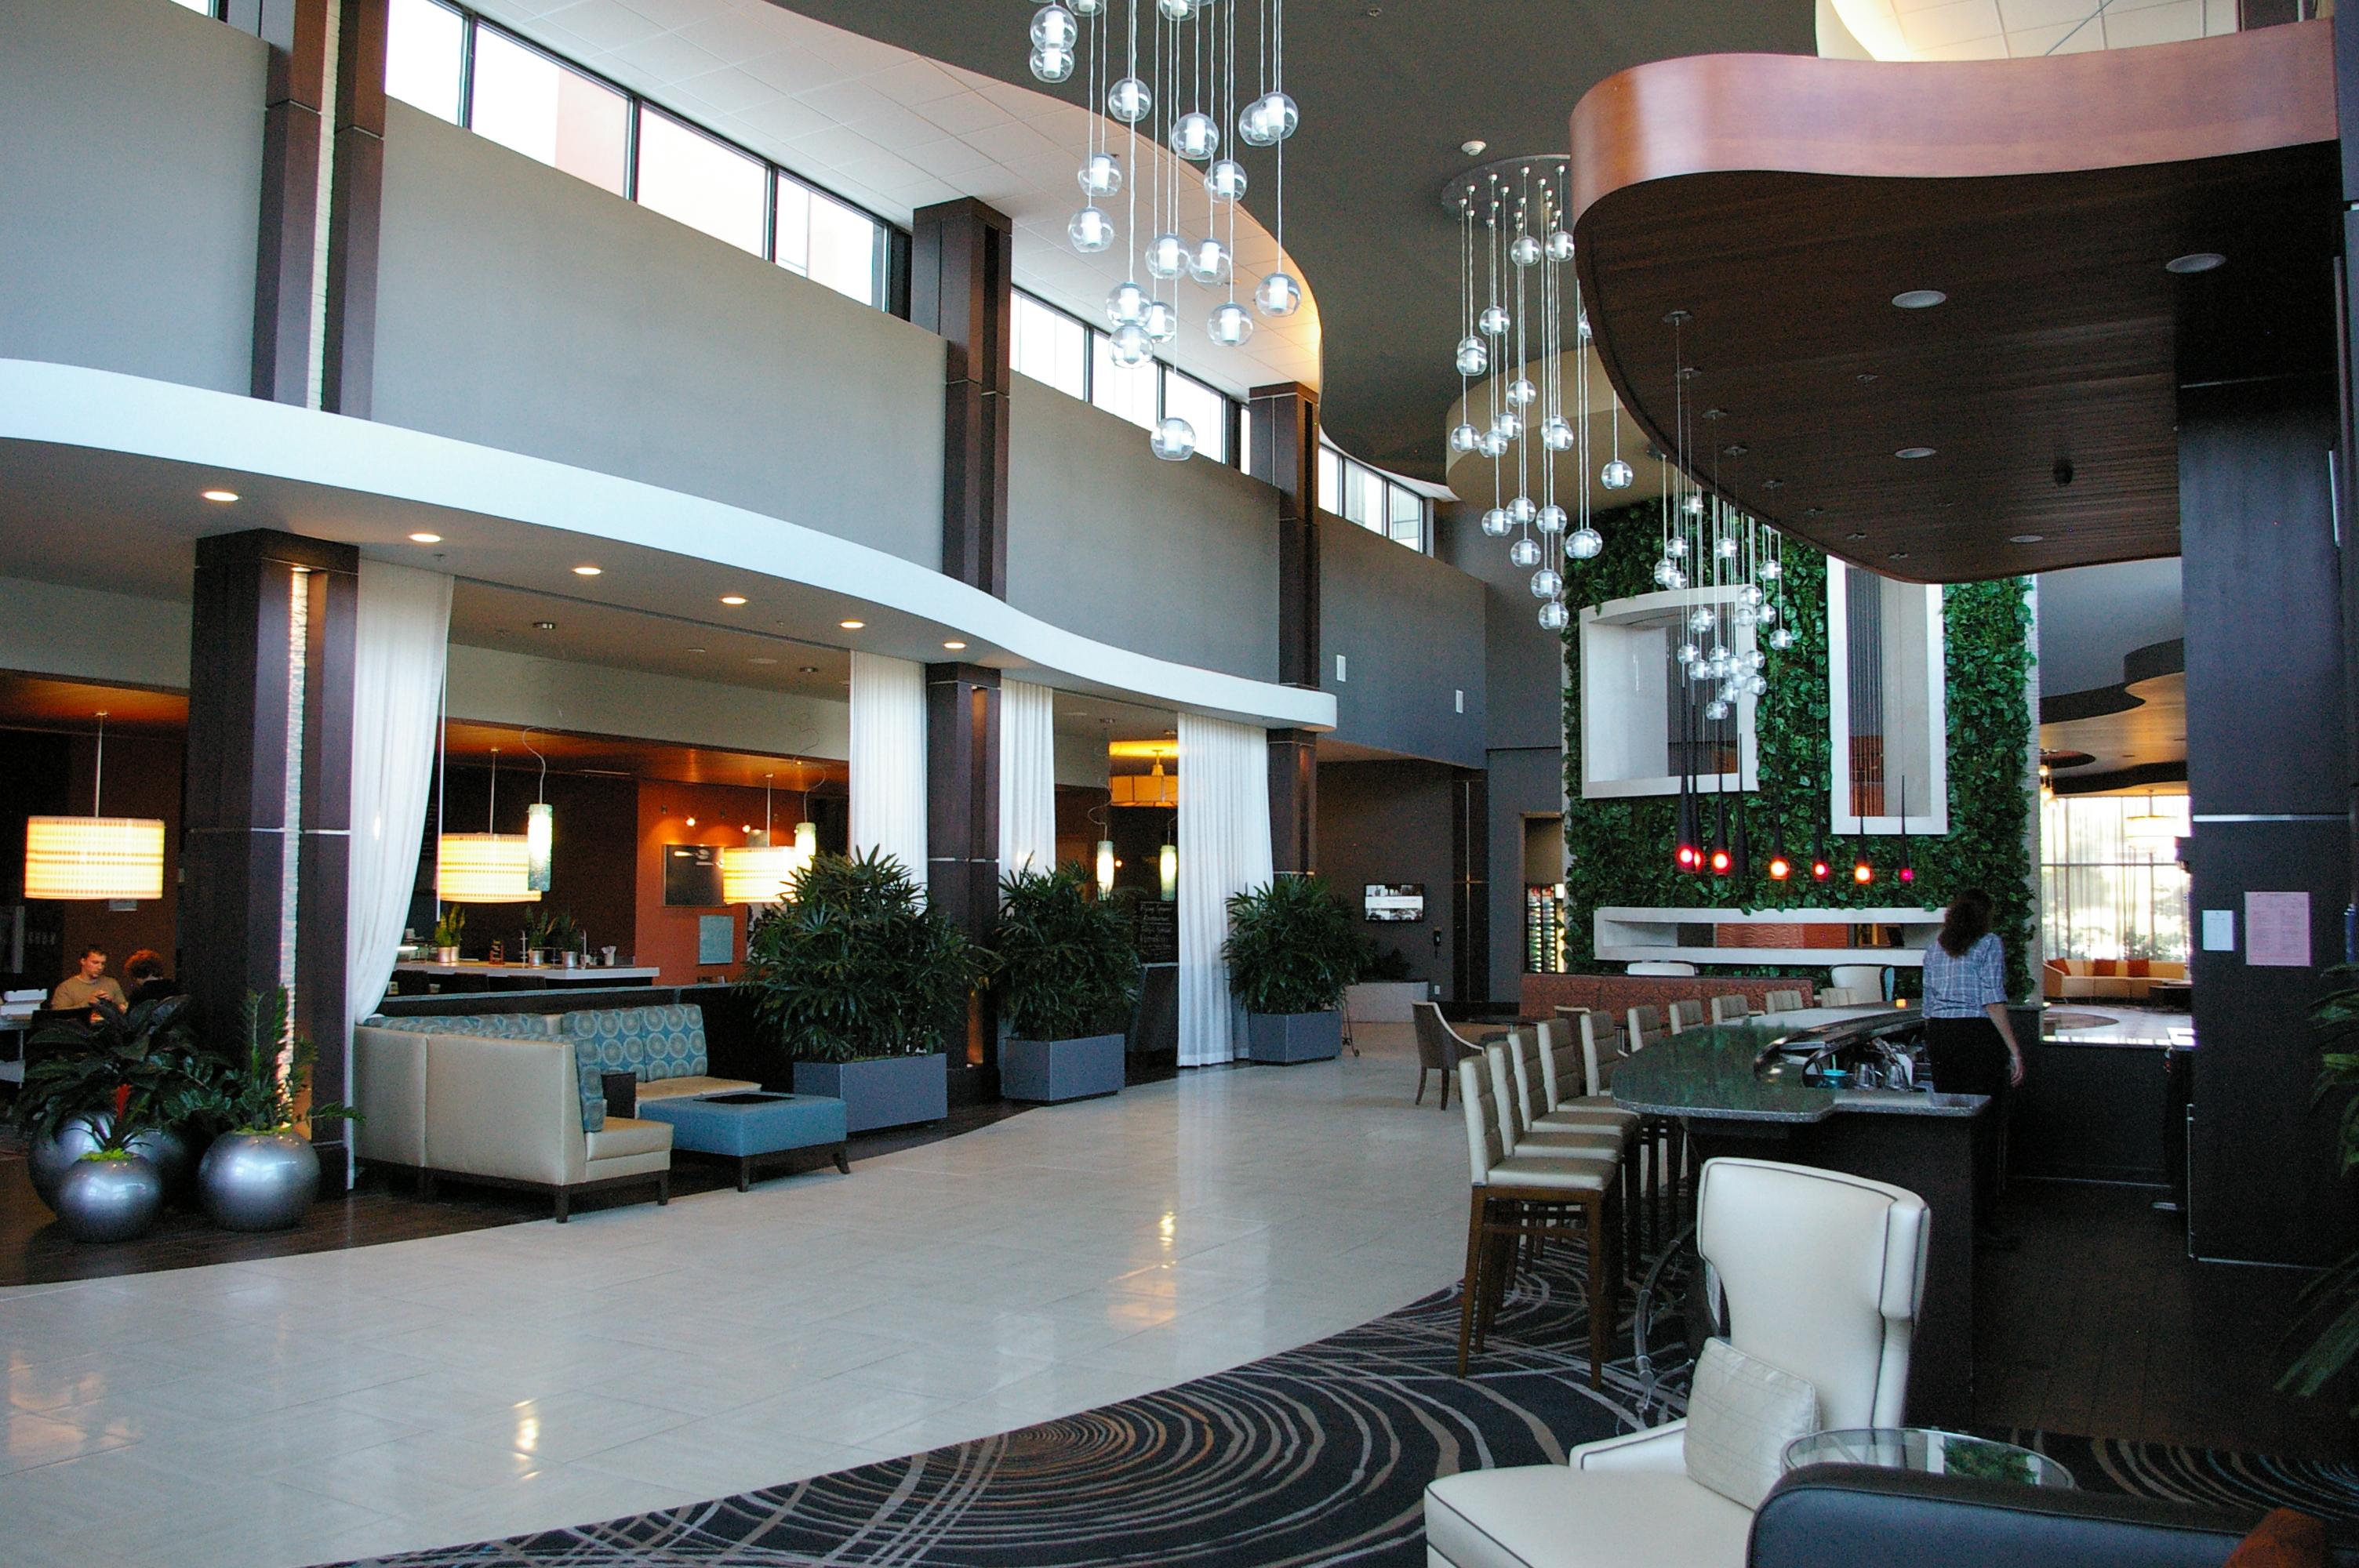 Hotels | Sun Electric Company of TN Inc.